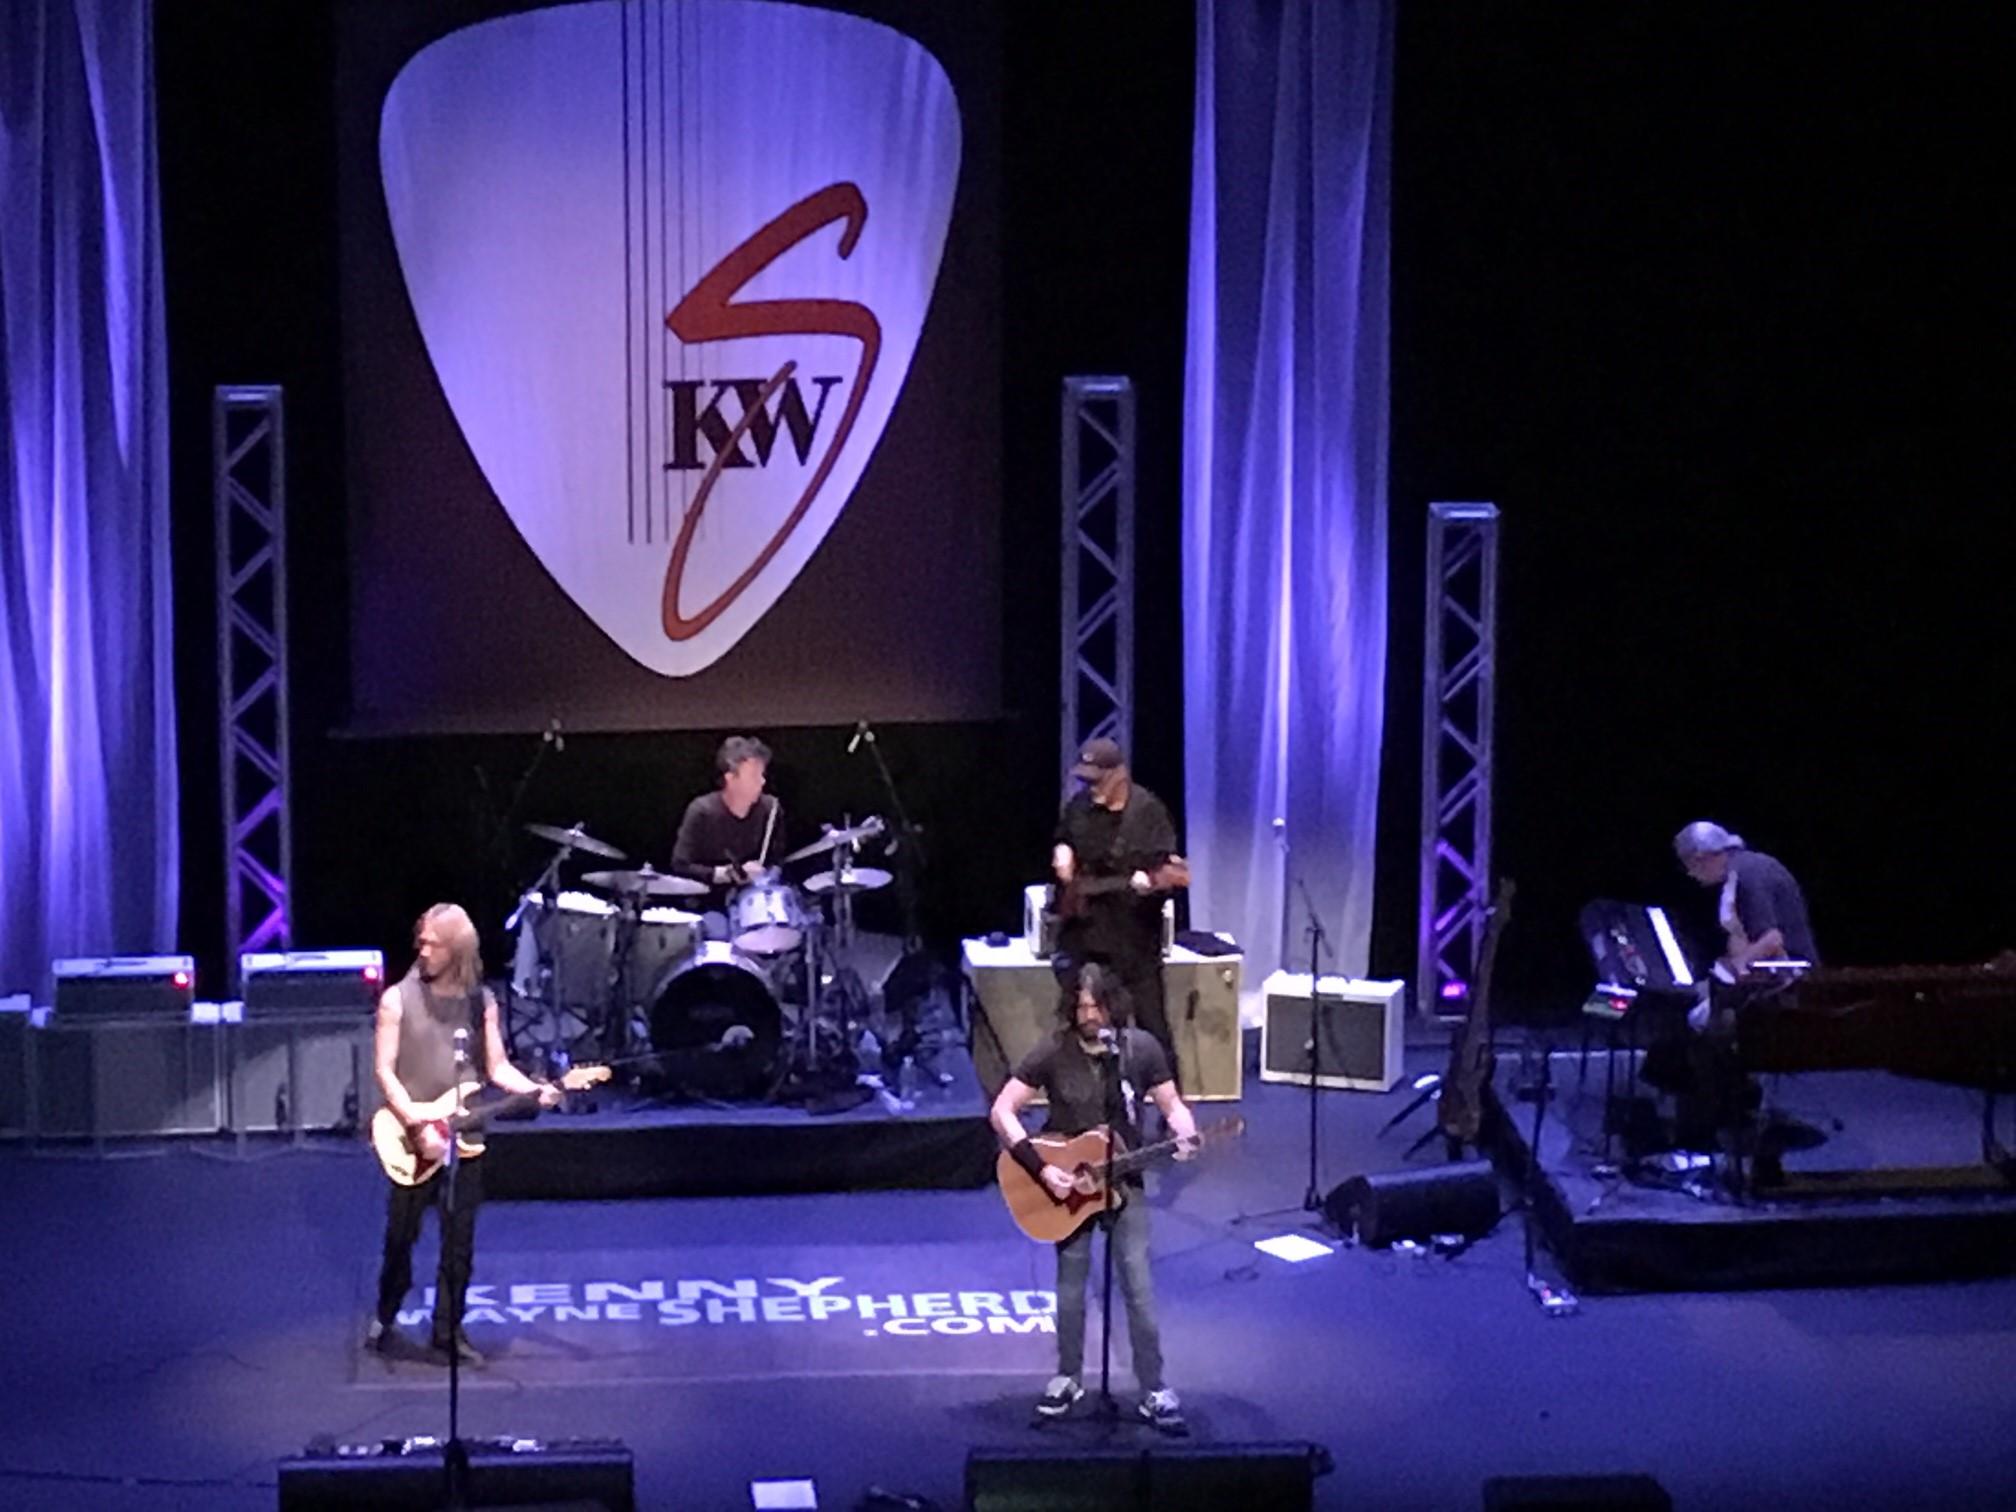 Kenny Wayne Shepherd Rocks Carolina Theatre – 9-26-17